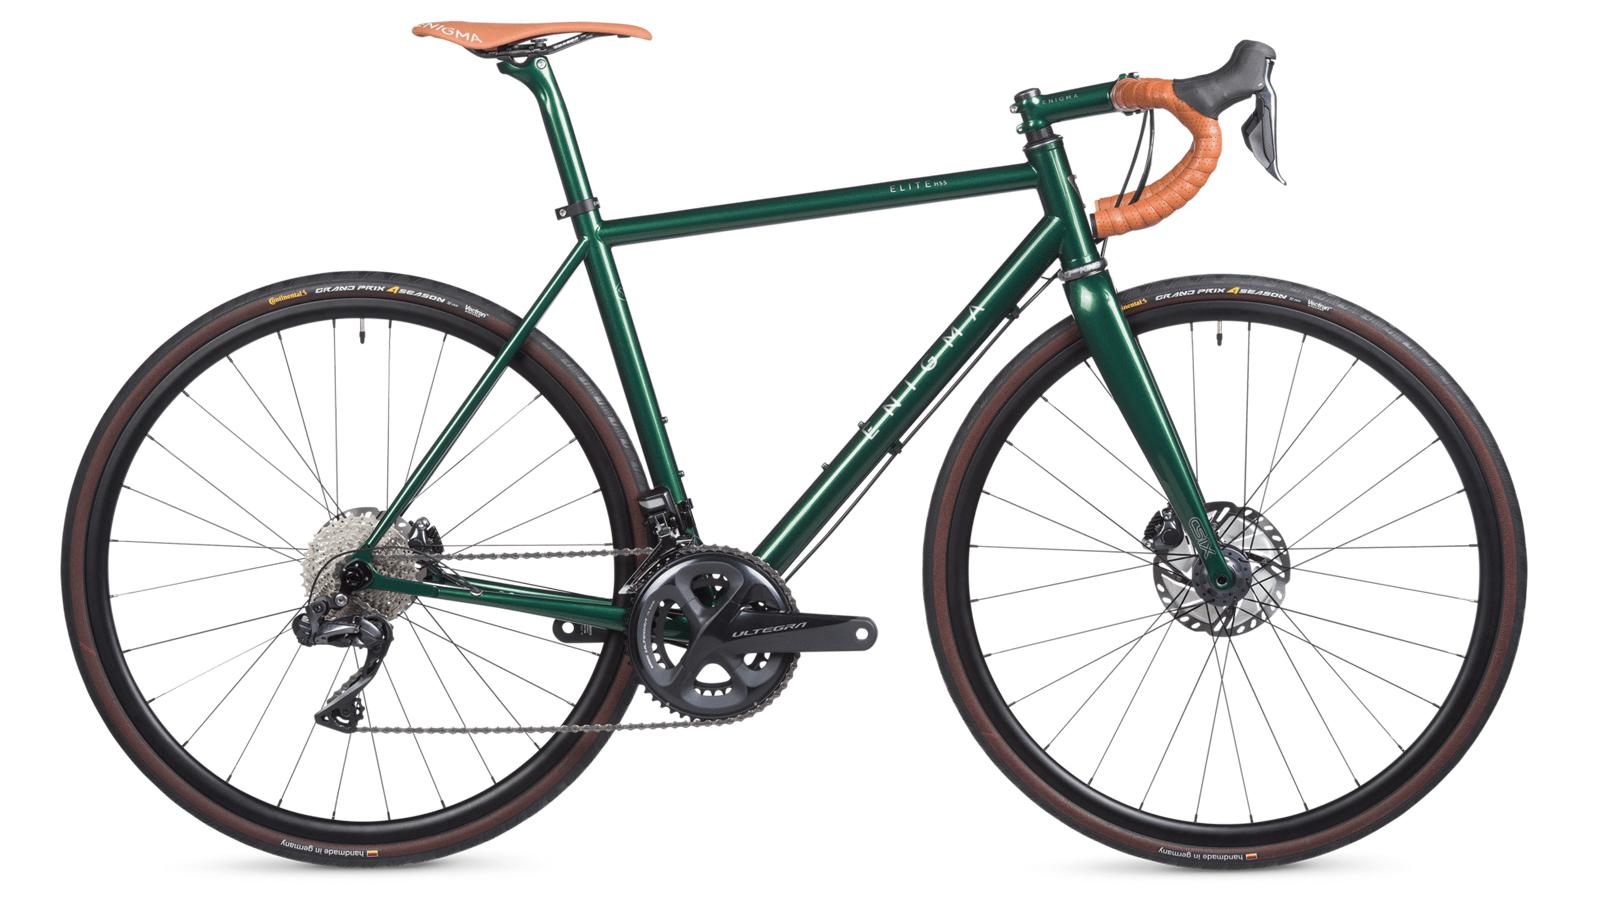 Best steel bikes: Enigma